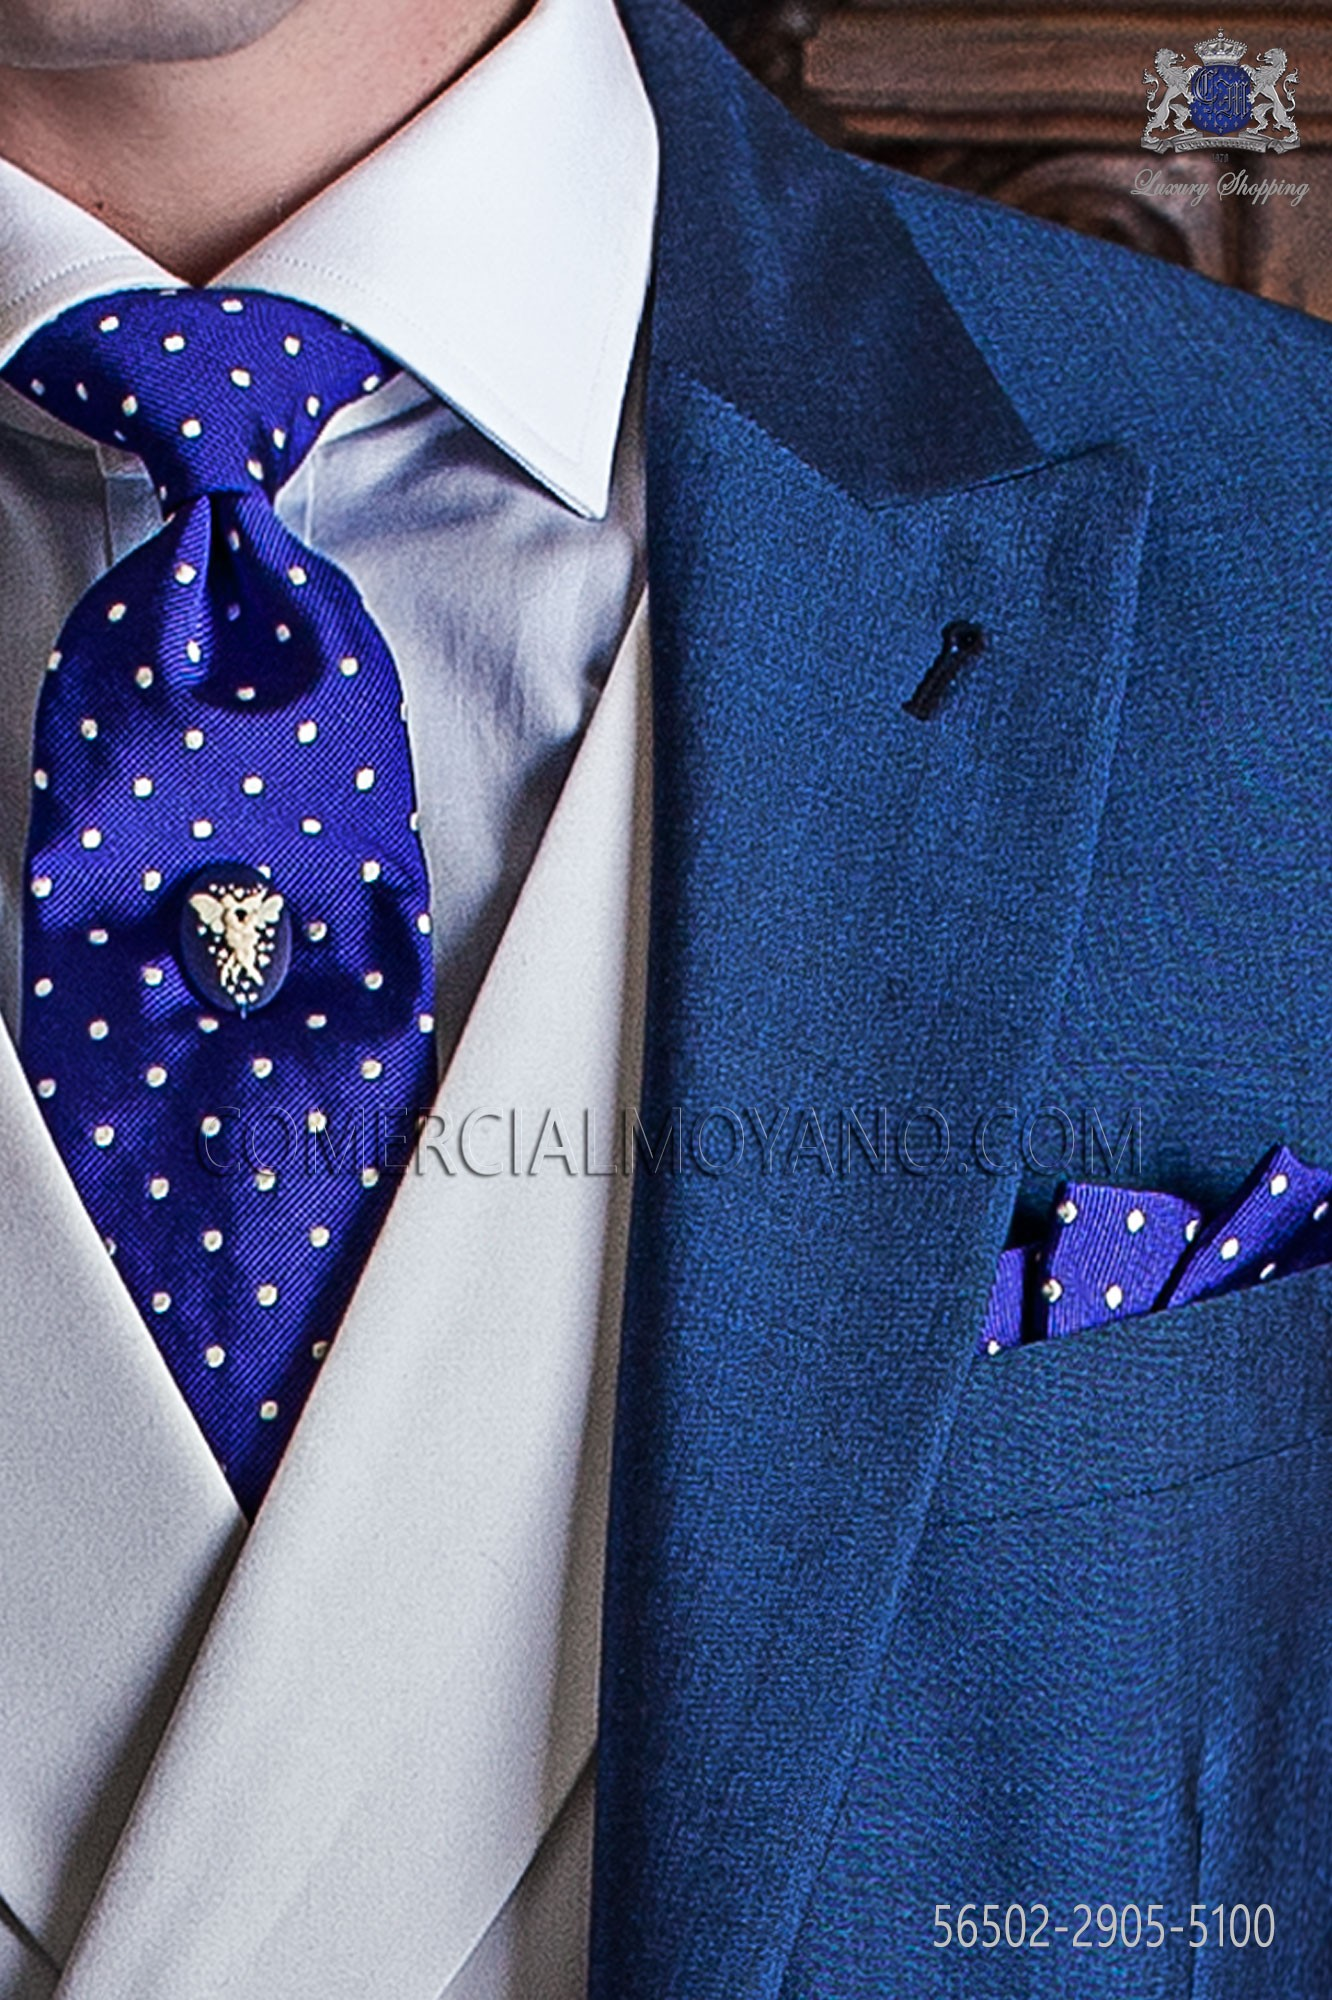 a91b9581d20b Royal Blue Ascot Tie - Image Of Tie